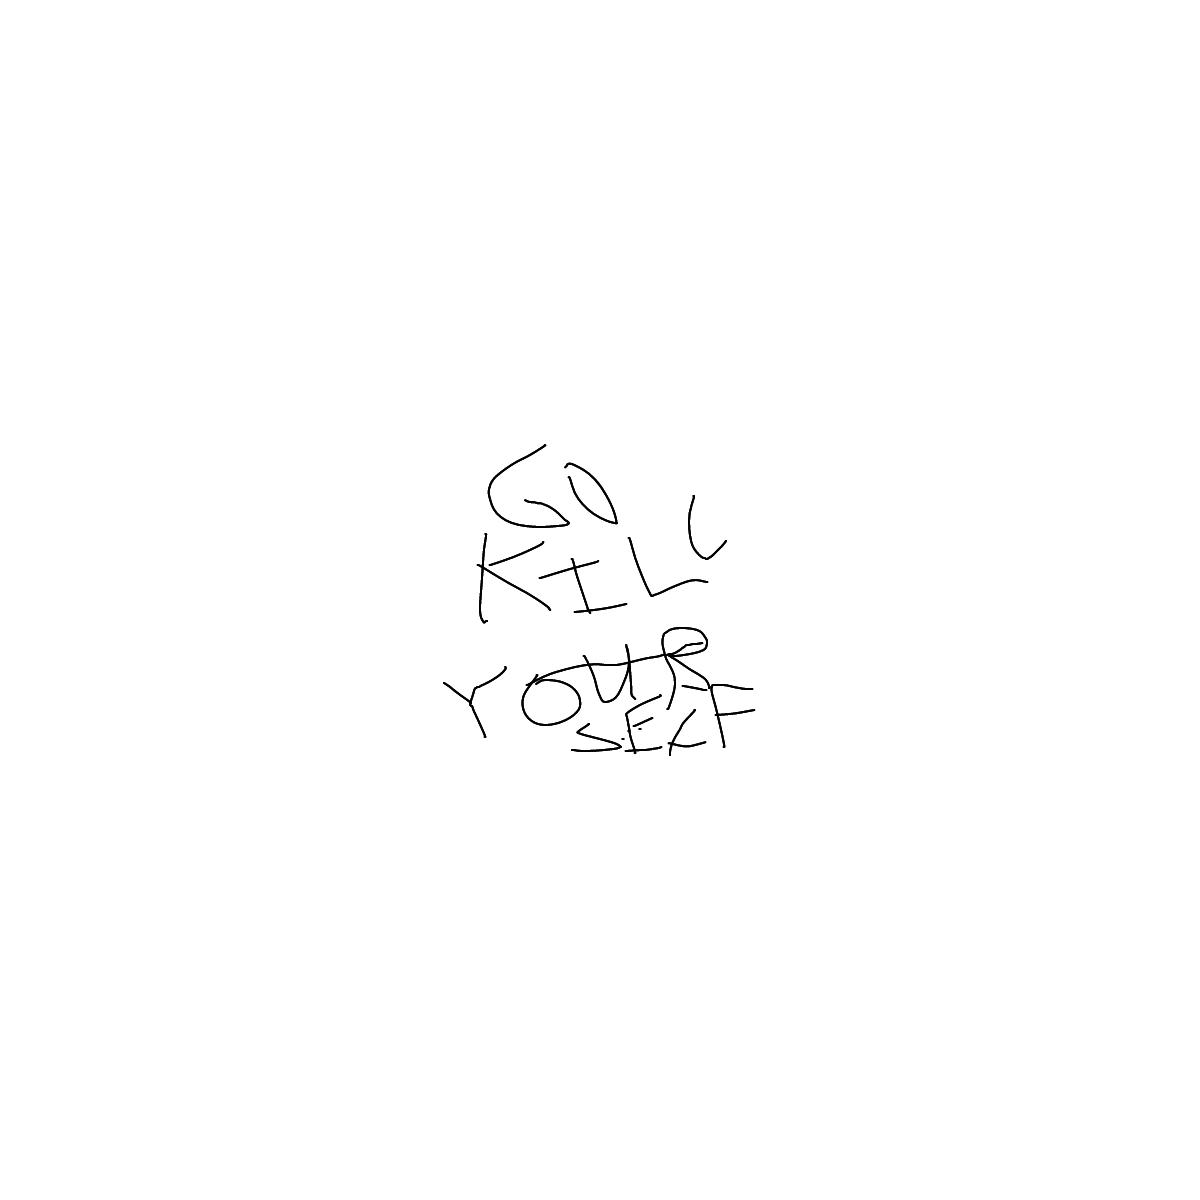 BAAAM drawing#4942 lat:45.9511451721191400lng: 18.4570312500000000